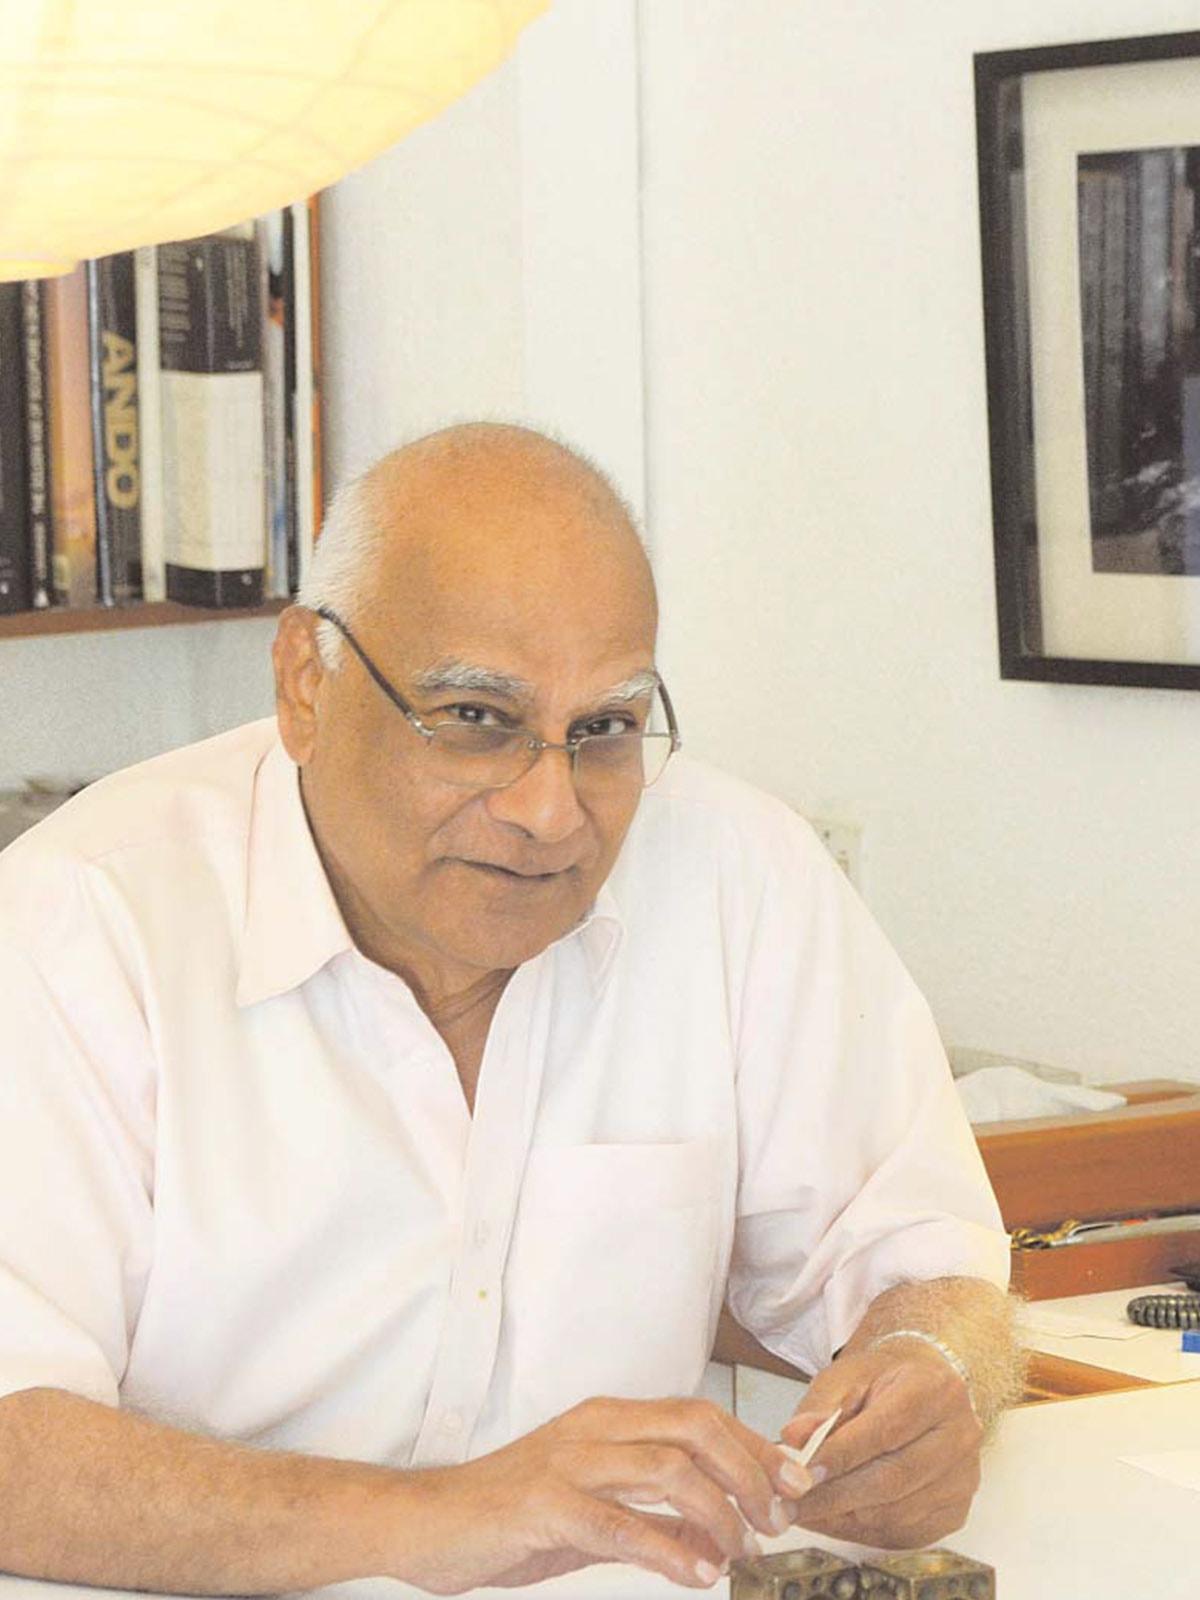 Habib Fida Ali | Emaan Rana, White Star